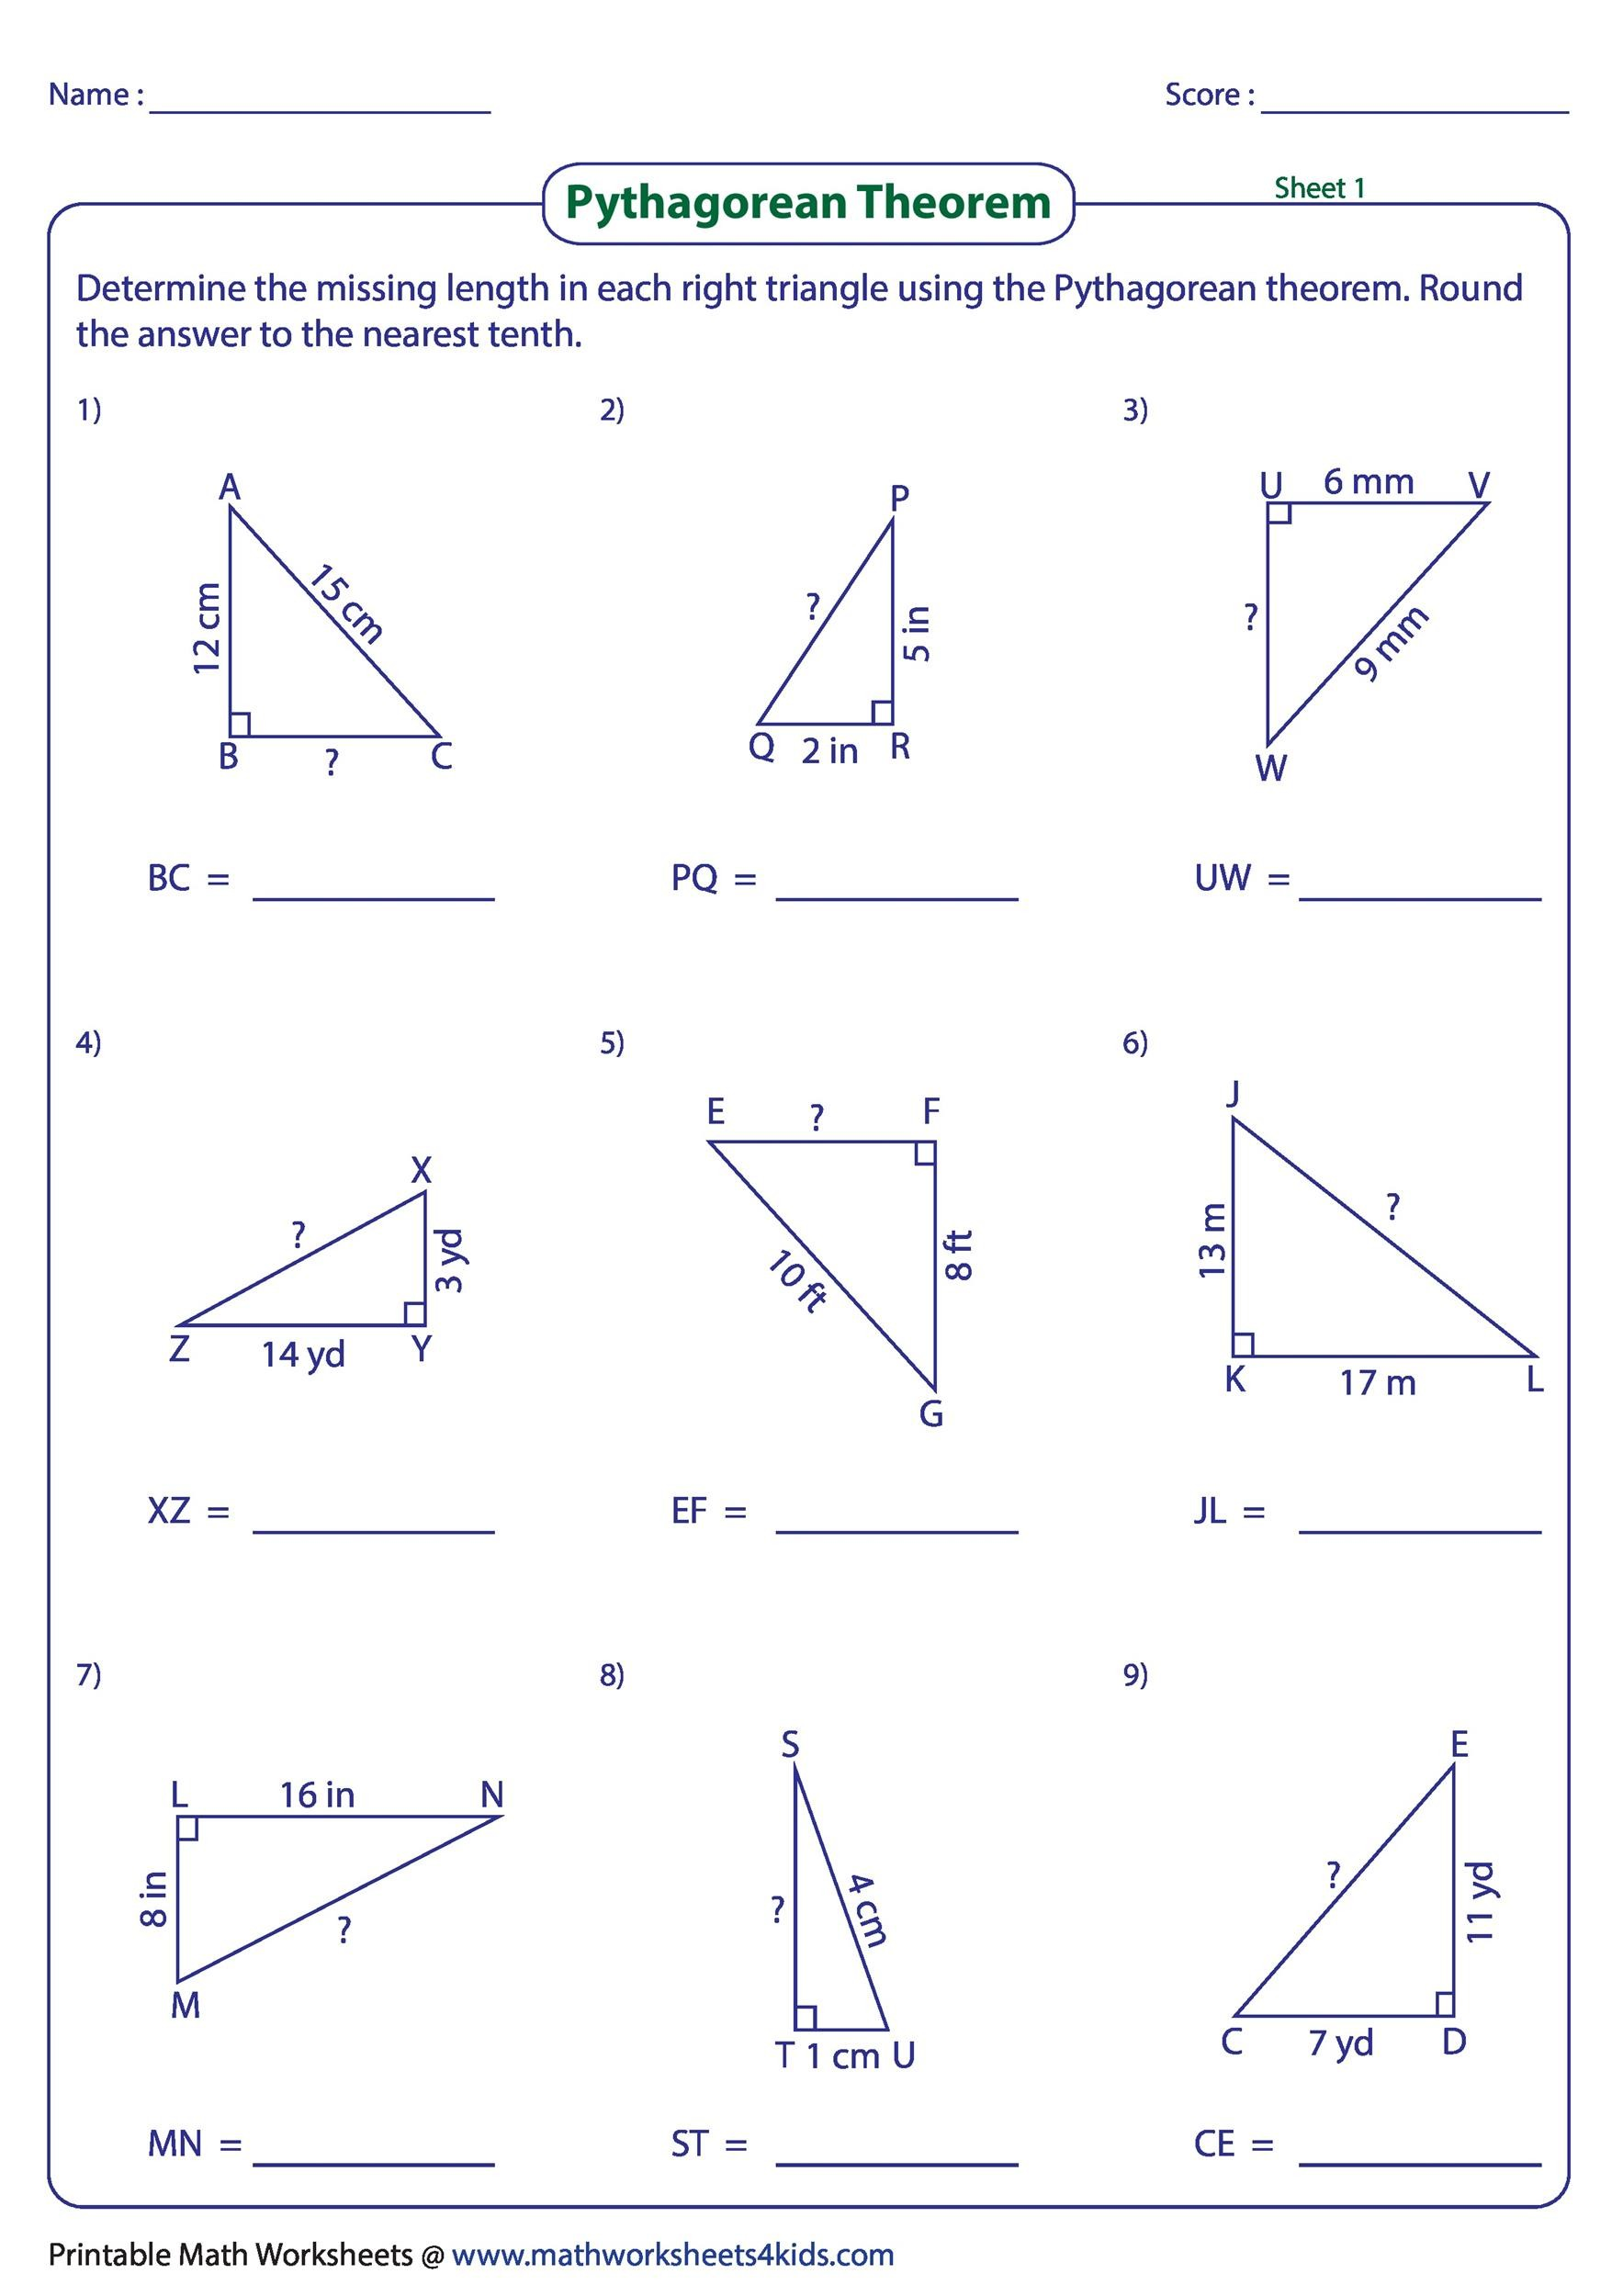 Free pythagorean theorem 06